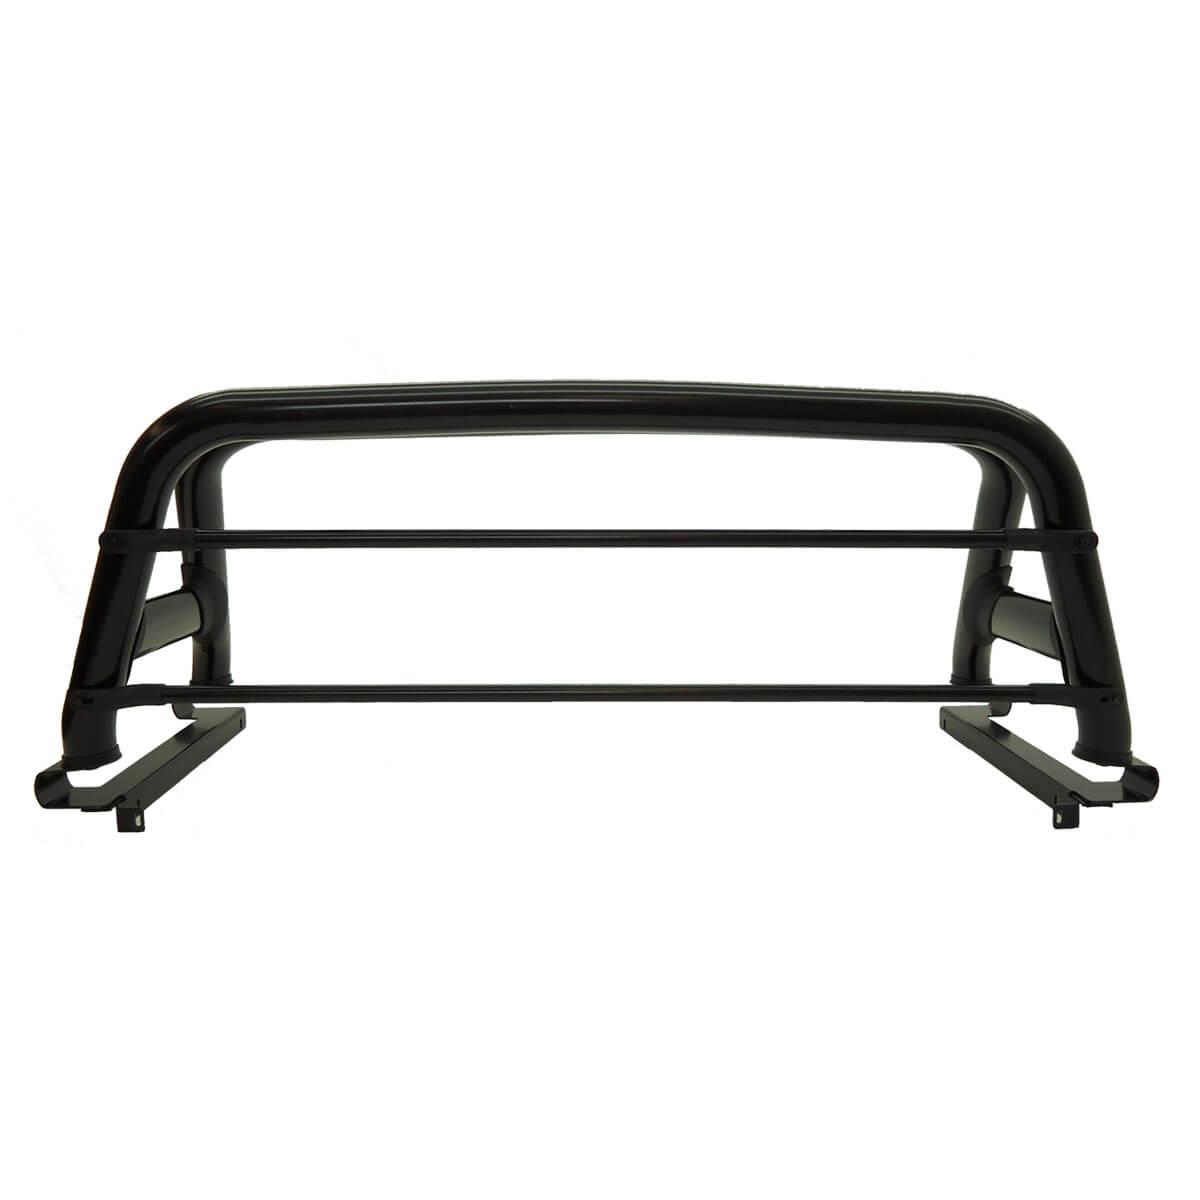 Santo antônio duplo preto Nova Ranger 2013 a 2018 com barras de vidro